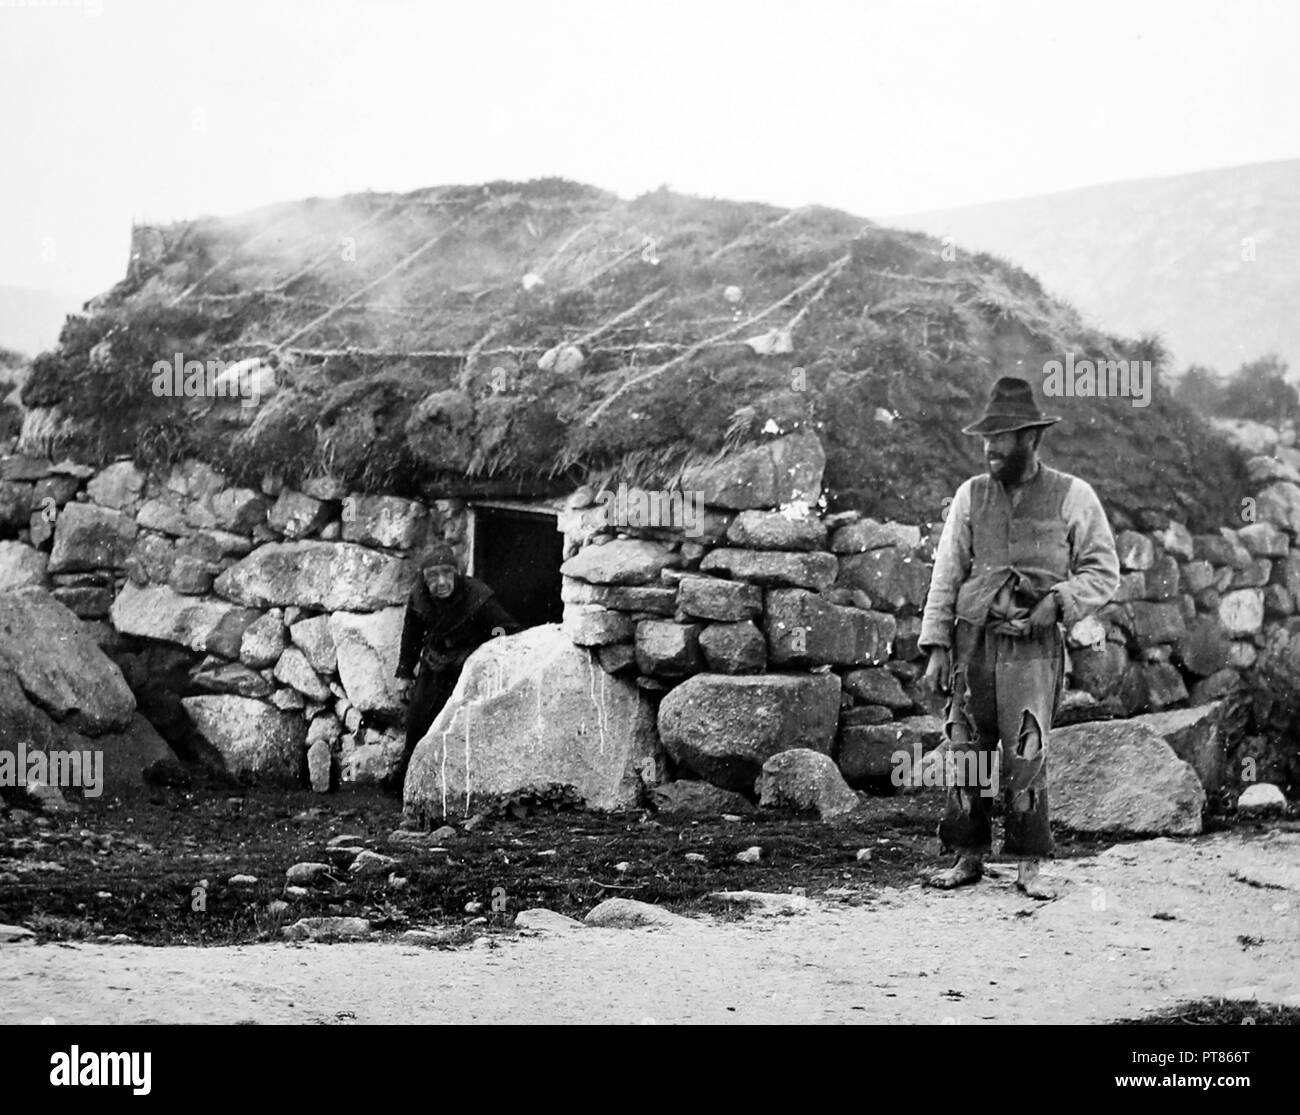 Kilkieran, West of Ireland, early 1900s - Stock Image